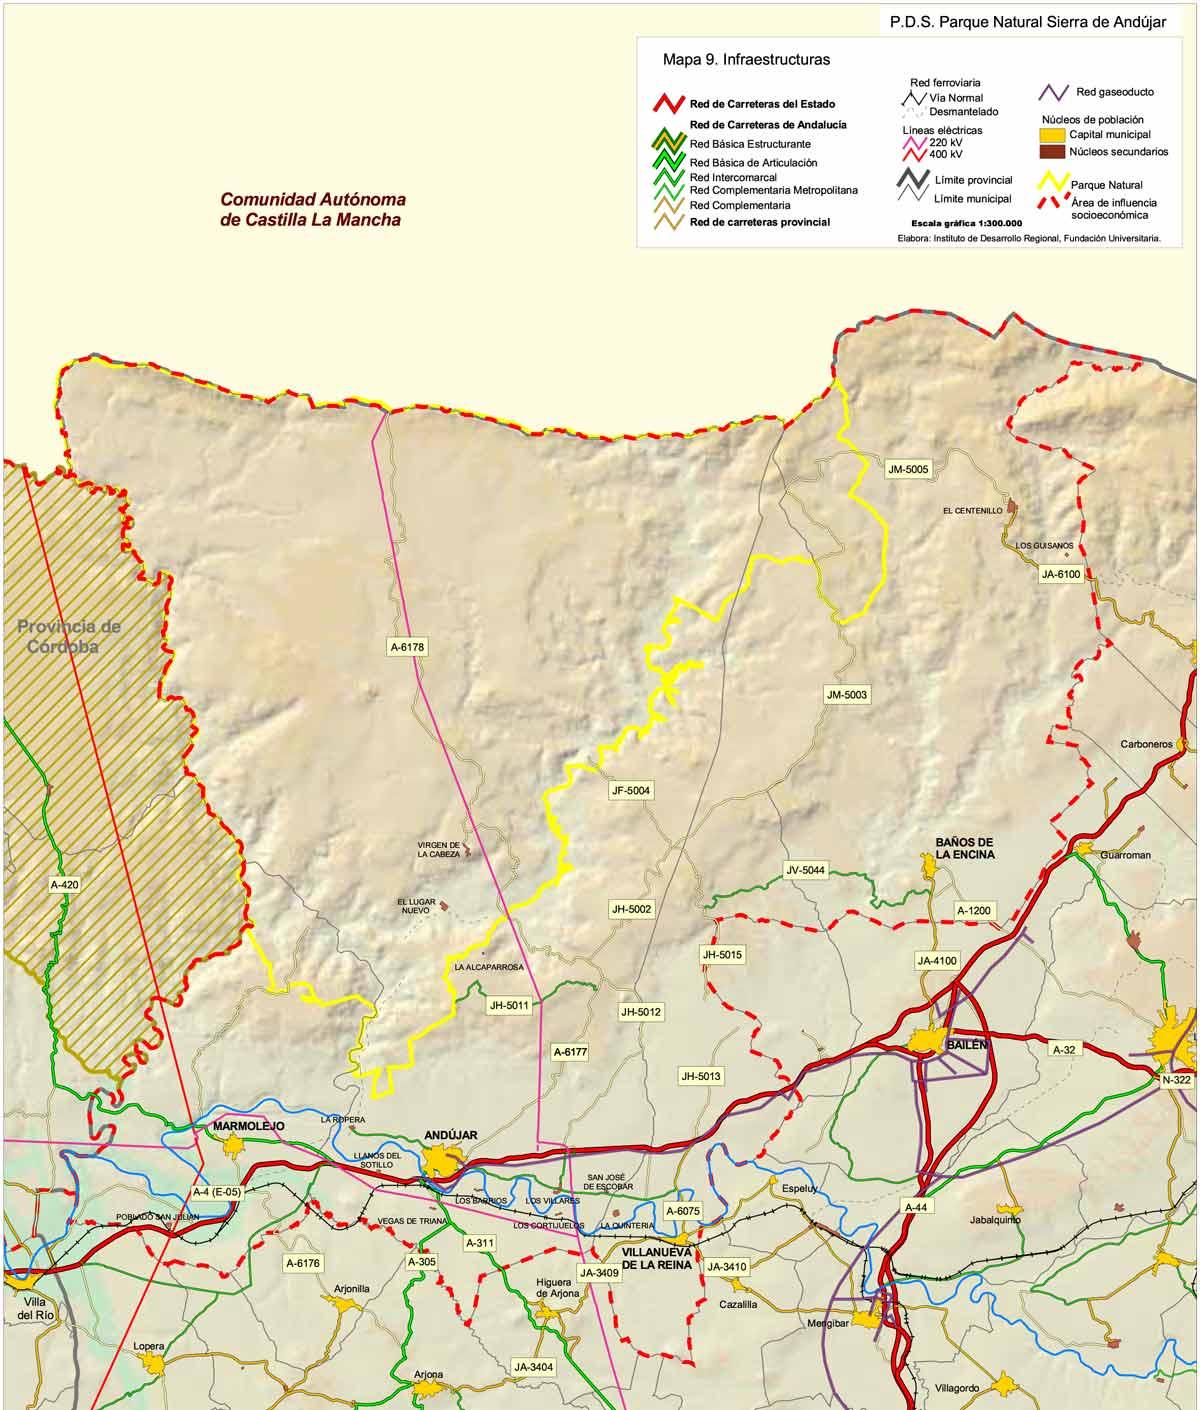 SIERRA DE ANDUJAR-PLANO INFRAESTRUCTURAS